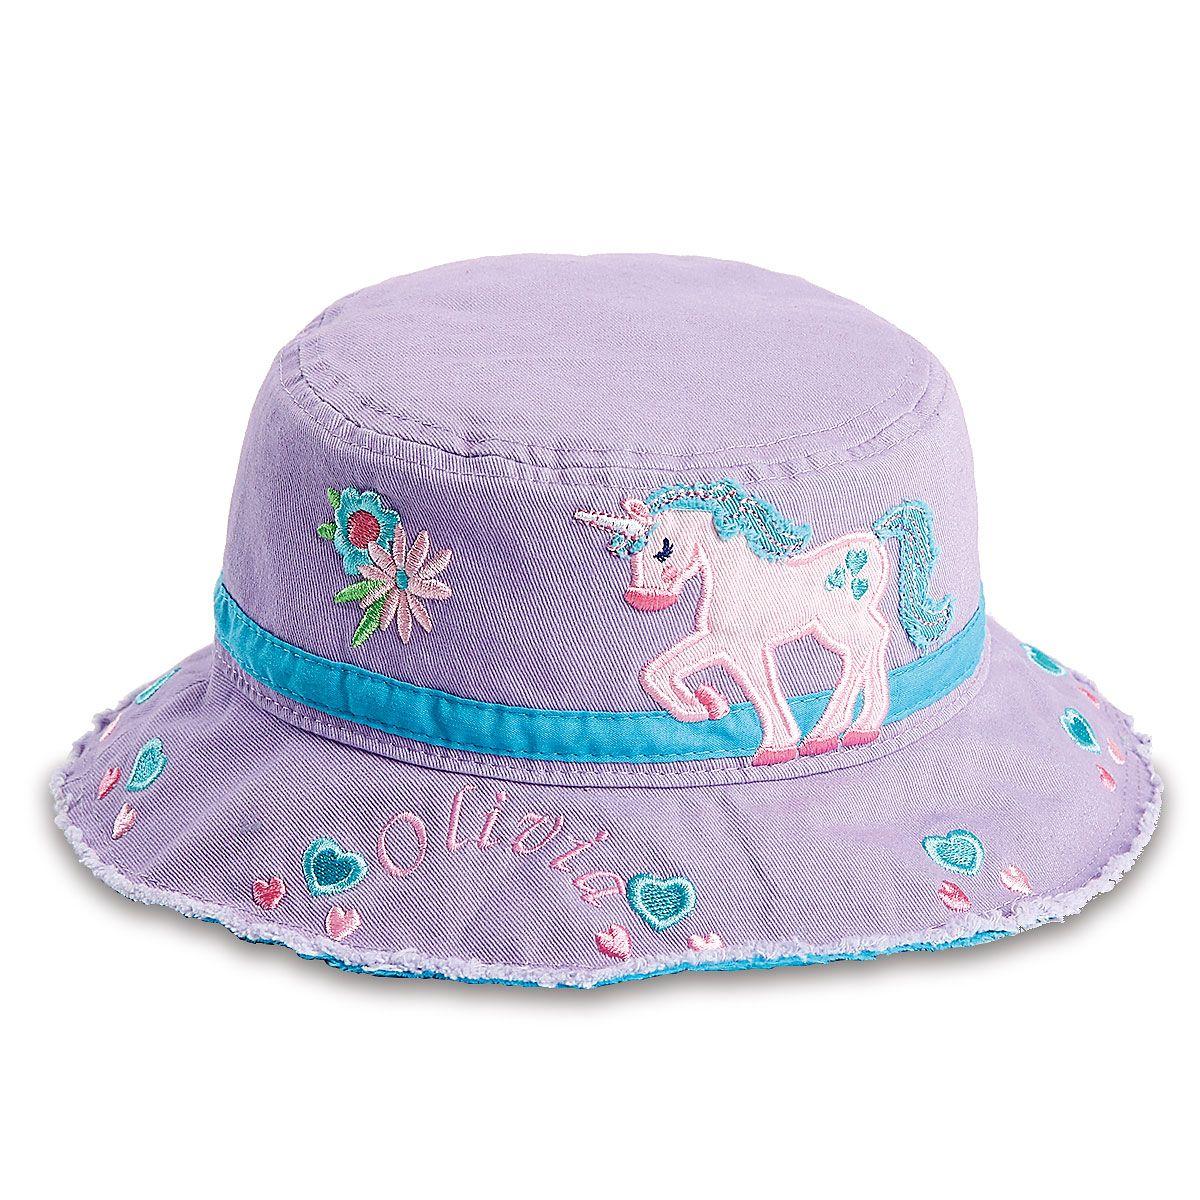 Personalized Unicorn Bucket Hat by Stephen Joseph®